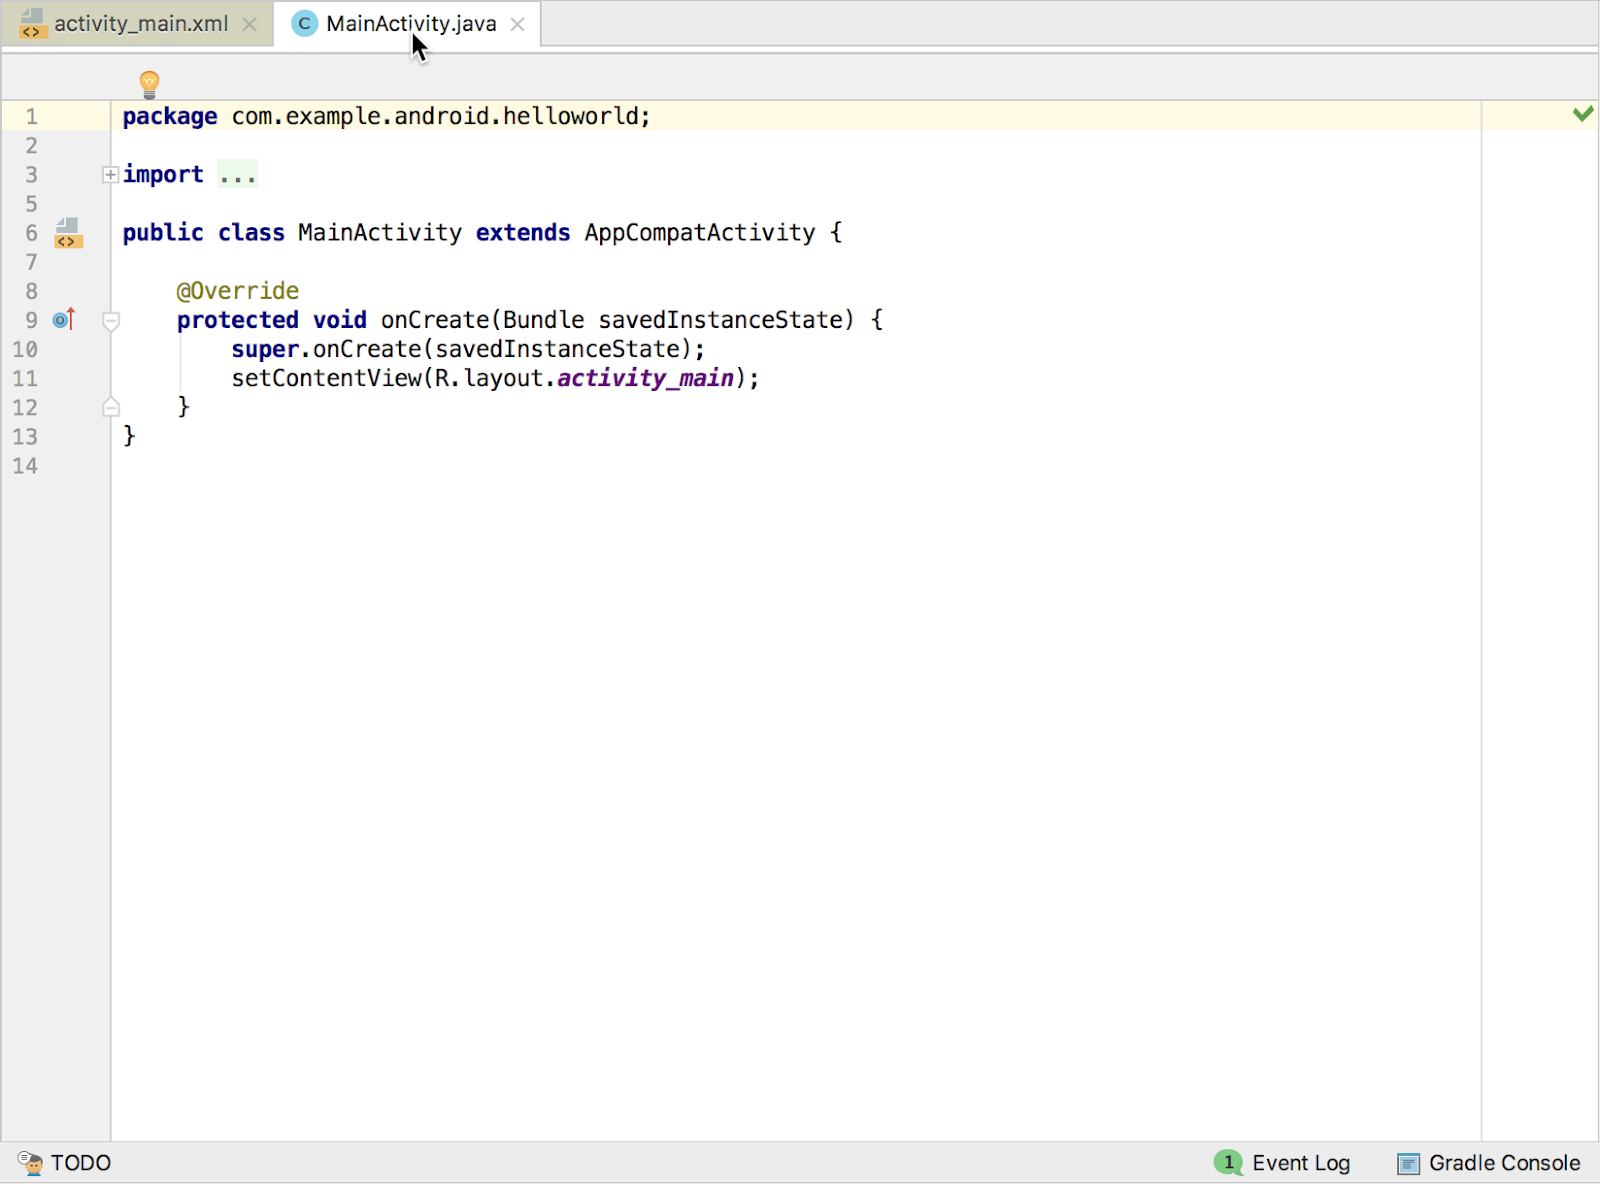 The code editor